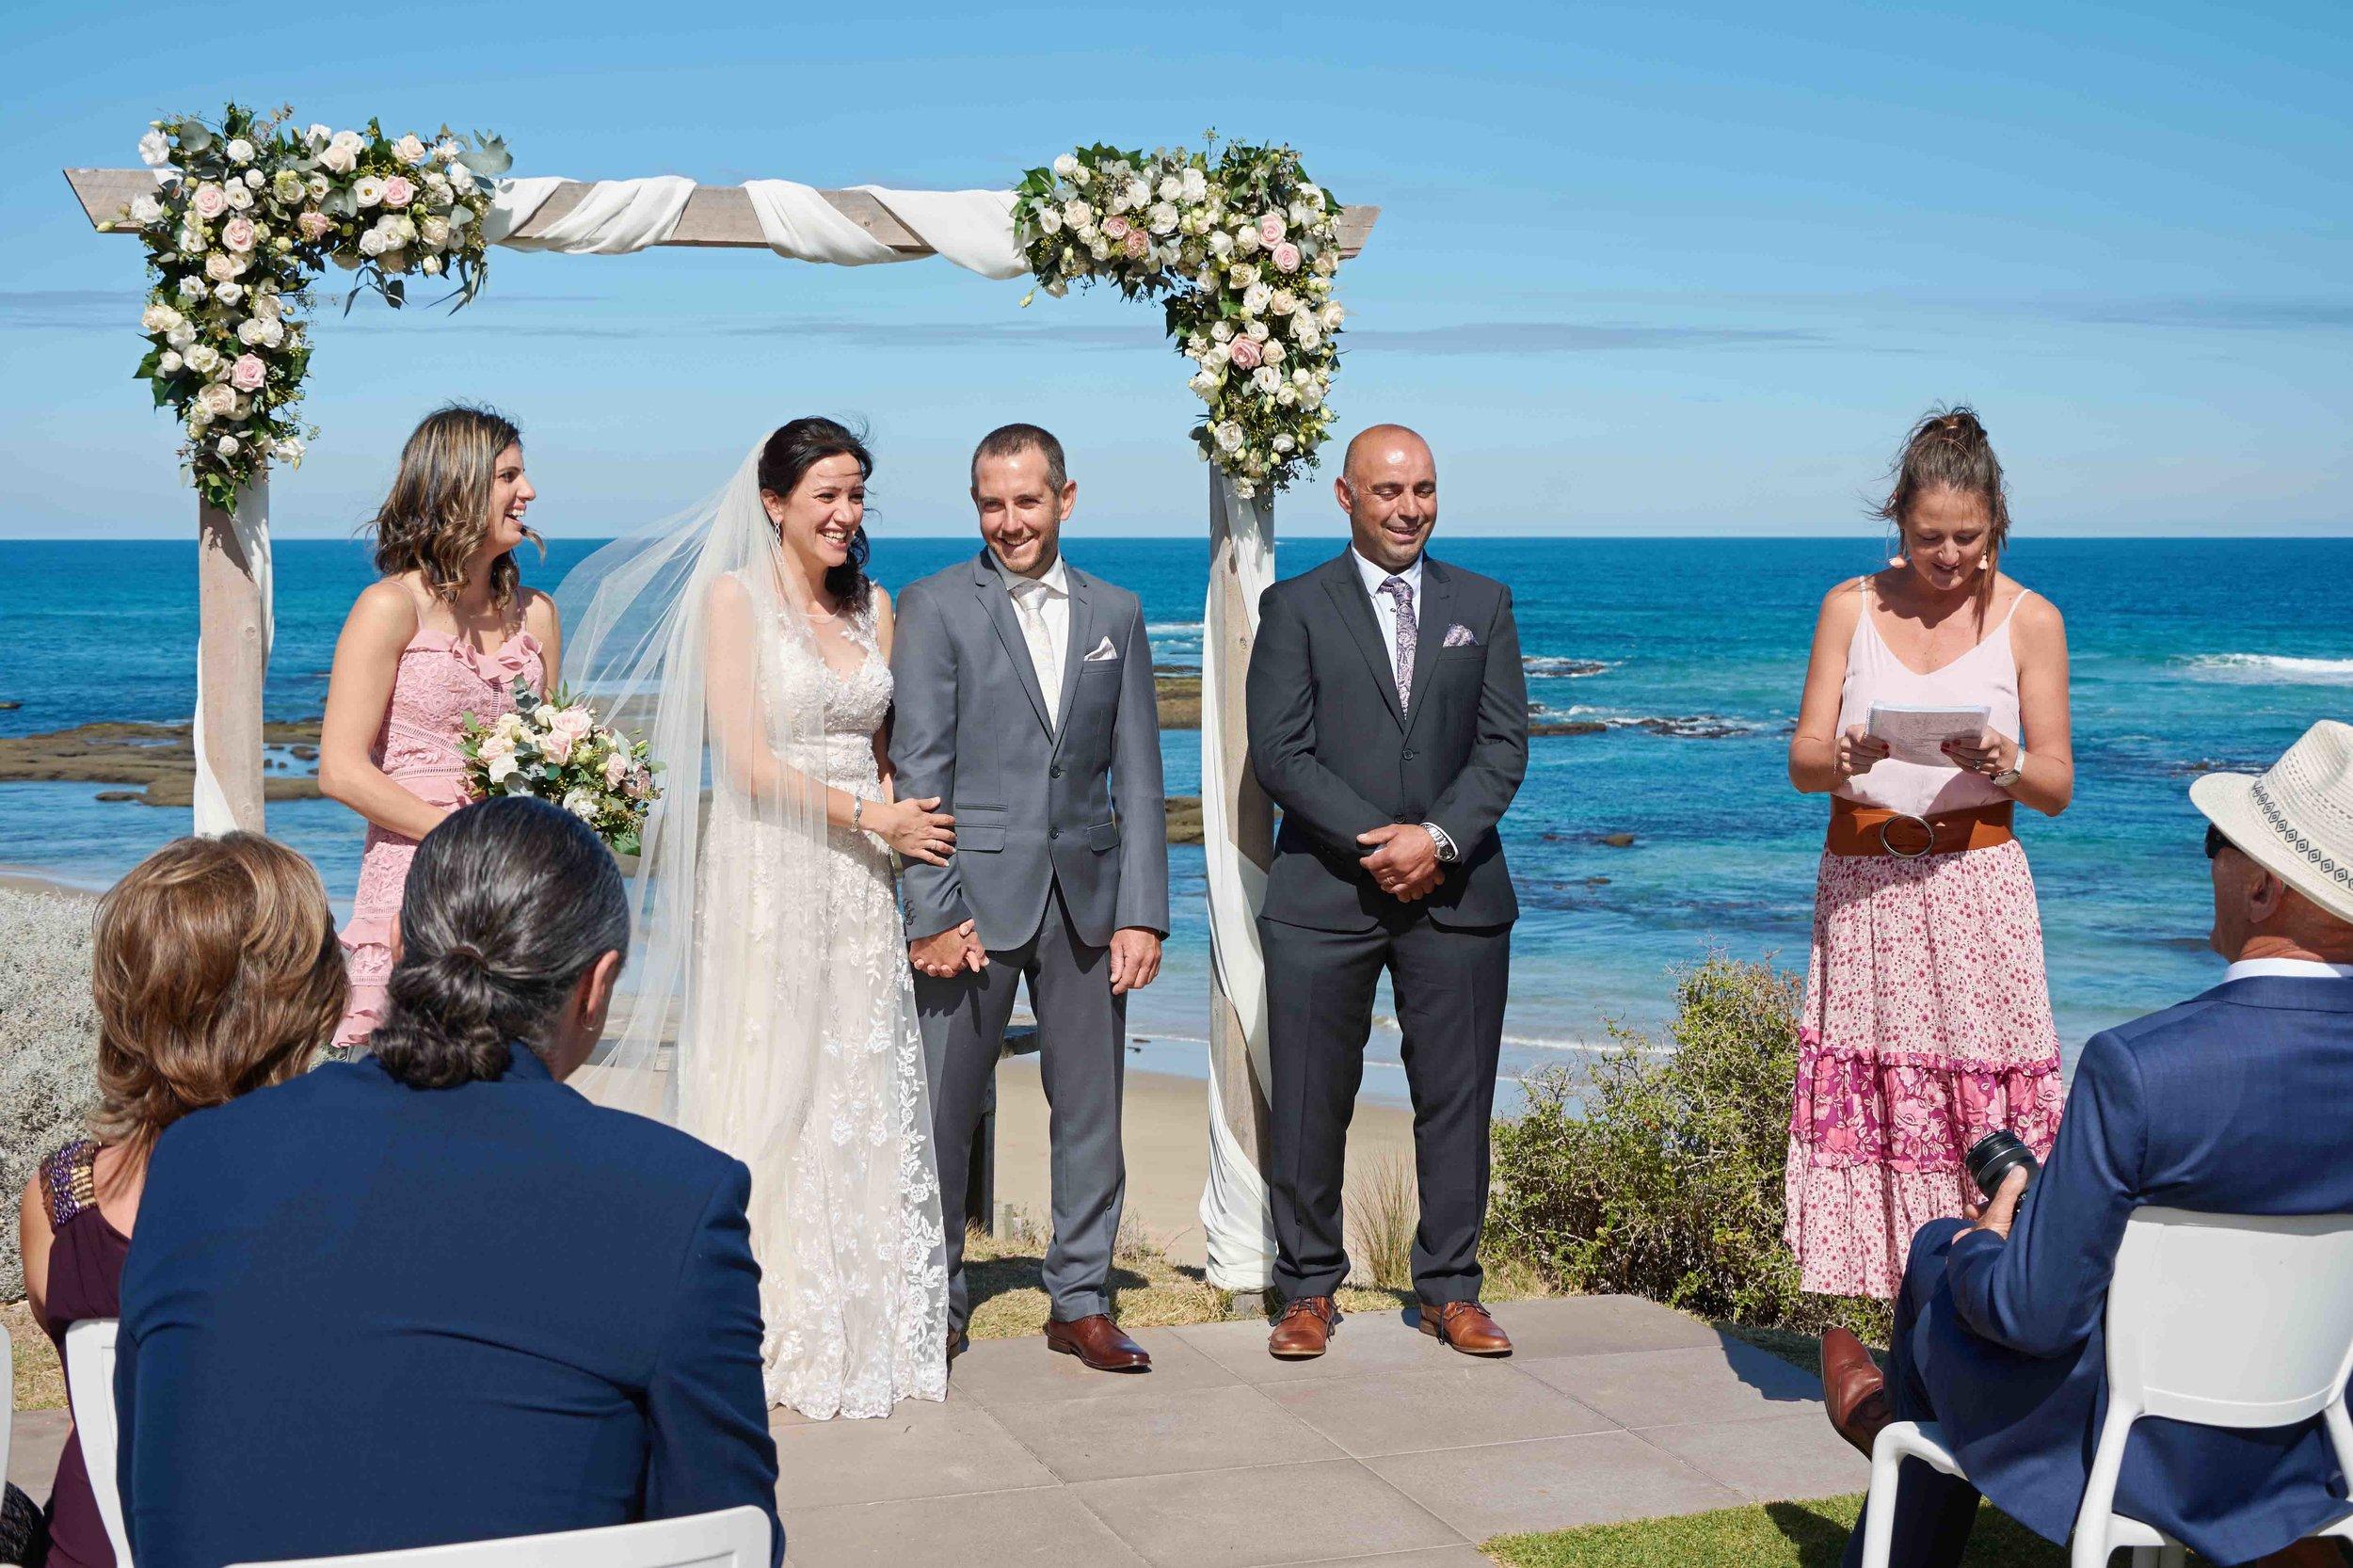 sorrento-wedding-photography-all-smiles-marissa-jade-photography-45.jpg